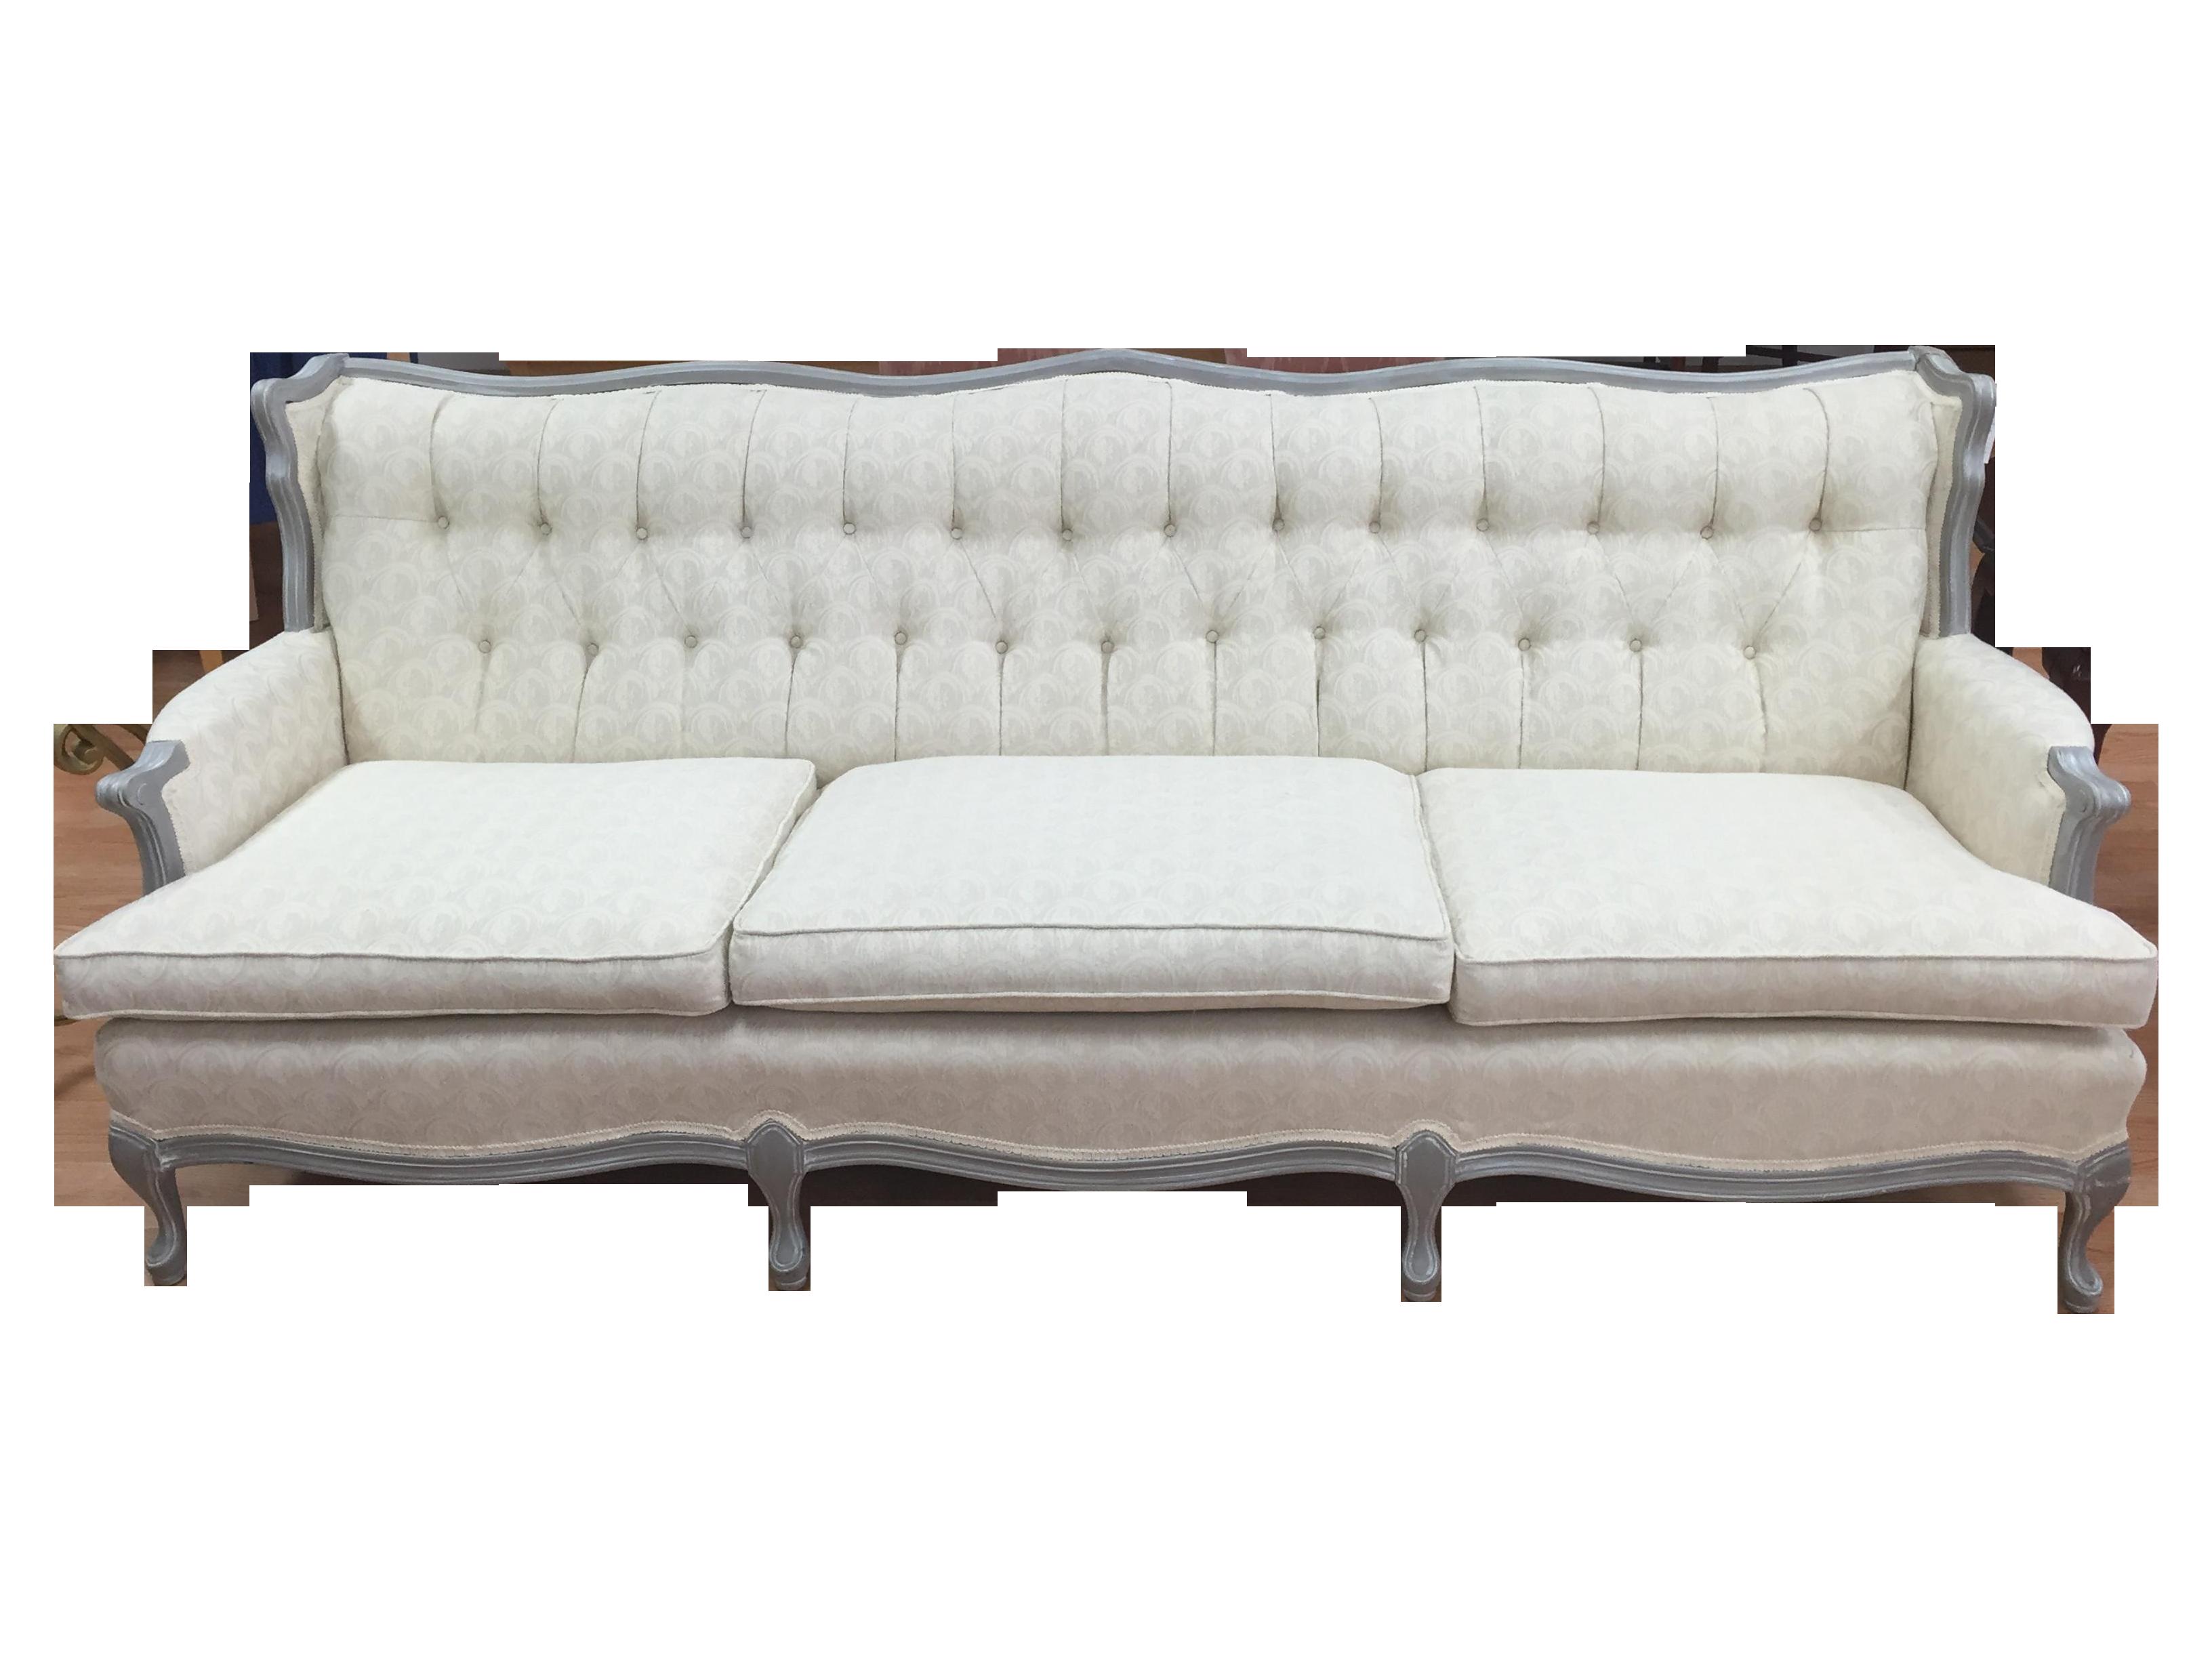 Vintage French Provincial Sofa Chairish